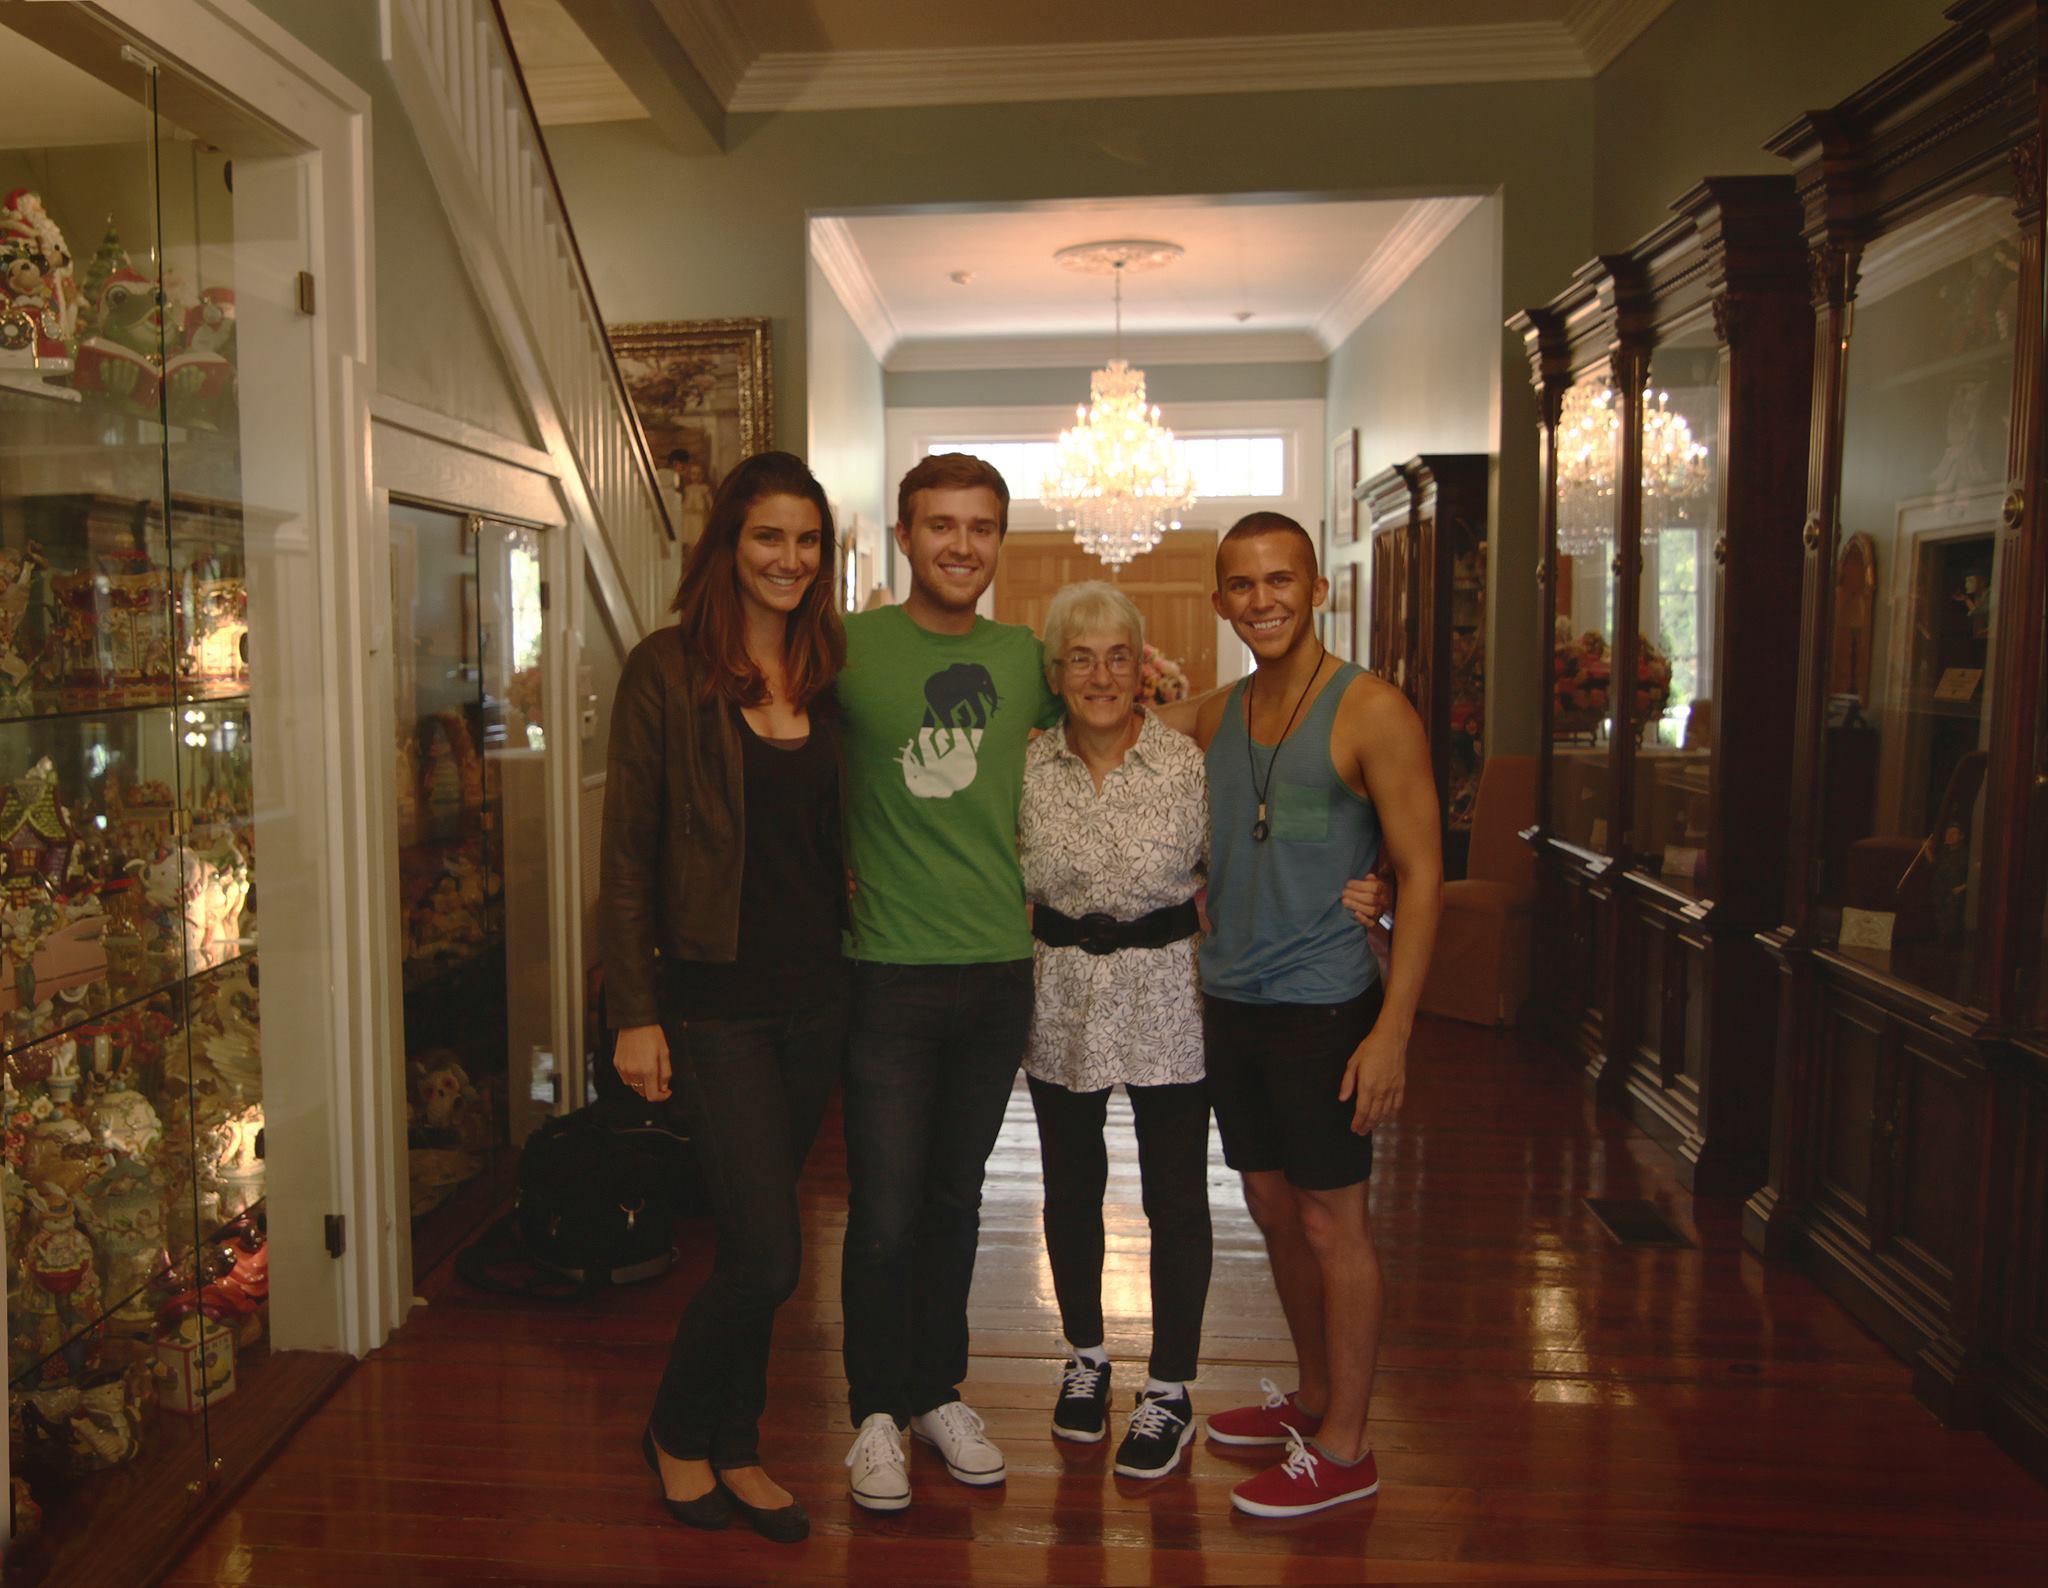 Phoebe (Vitamin Angels), Aaron (DP) and Theresea.